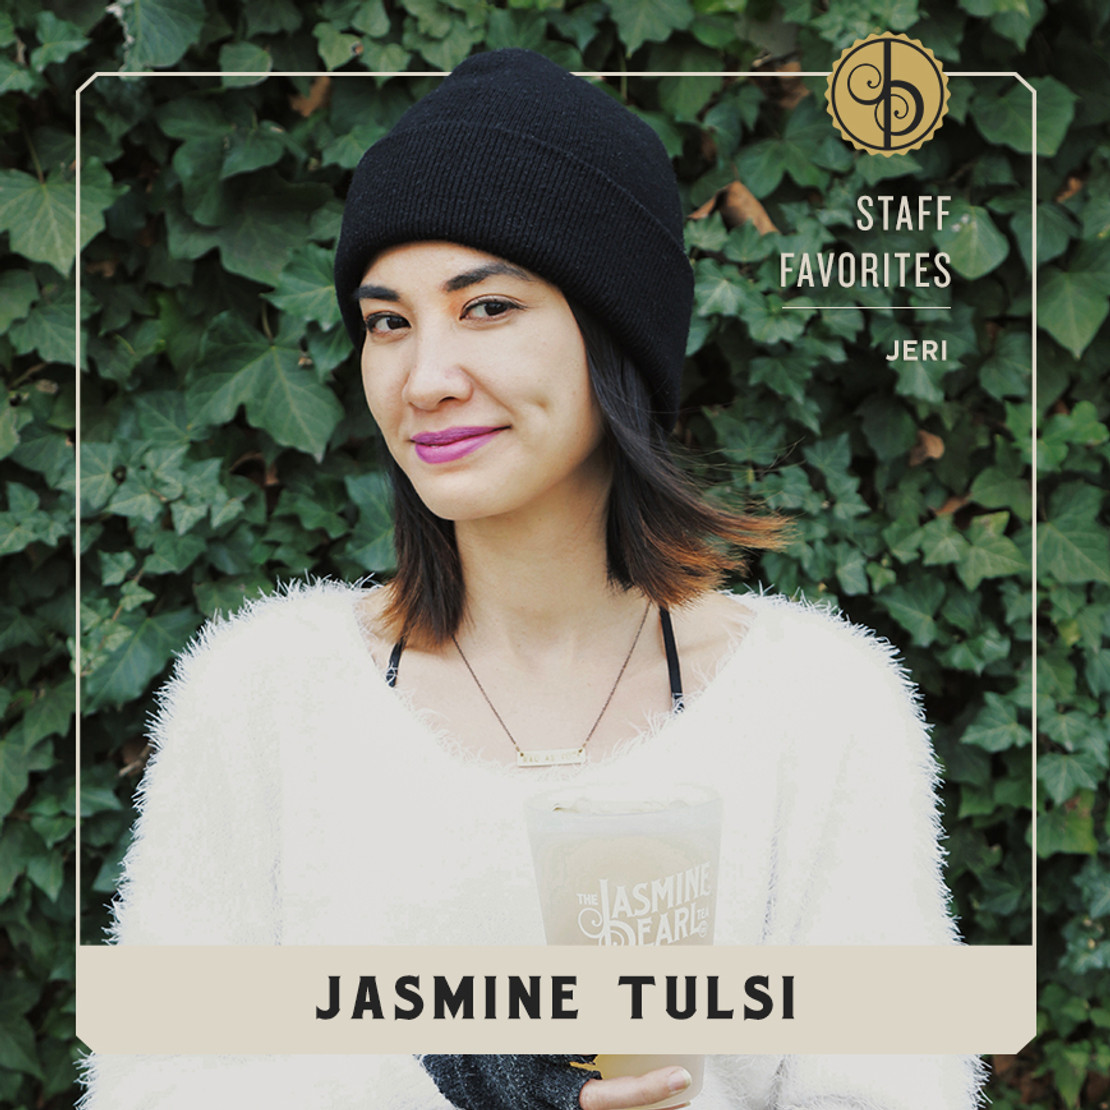 Staff Favorites: Jeri & Jasmine Tulsi